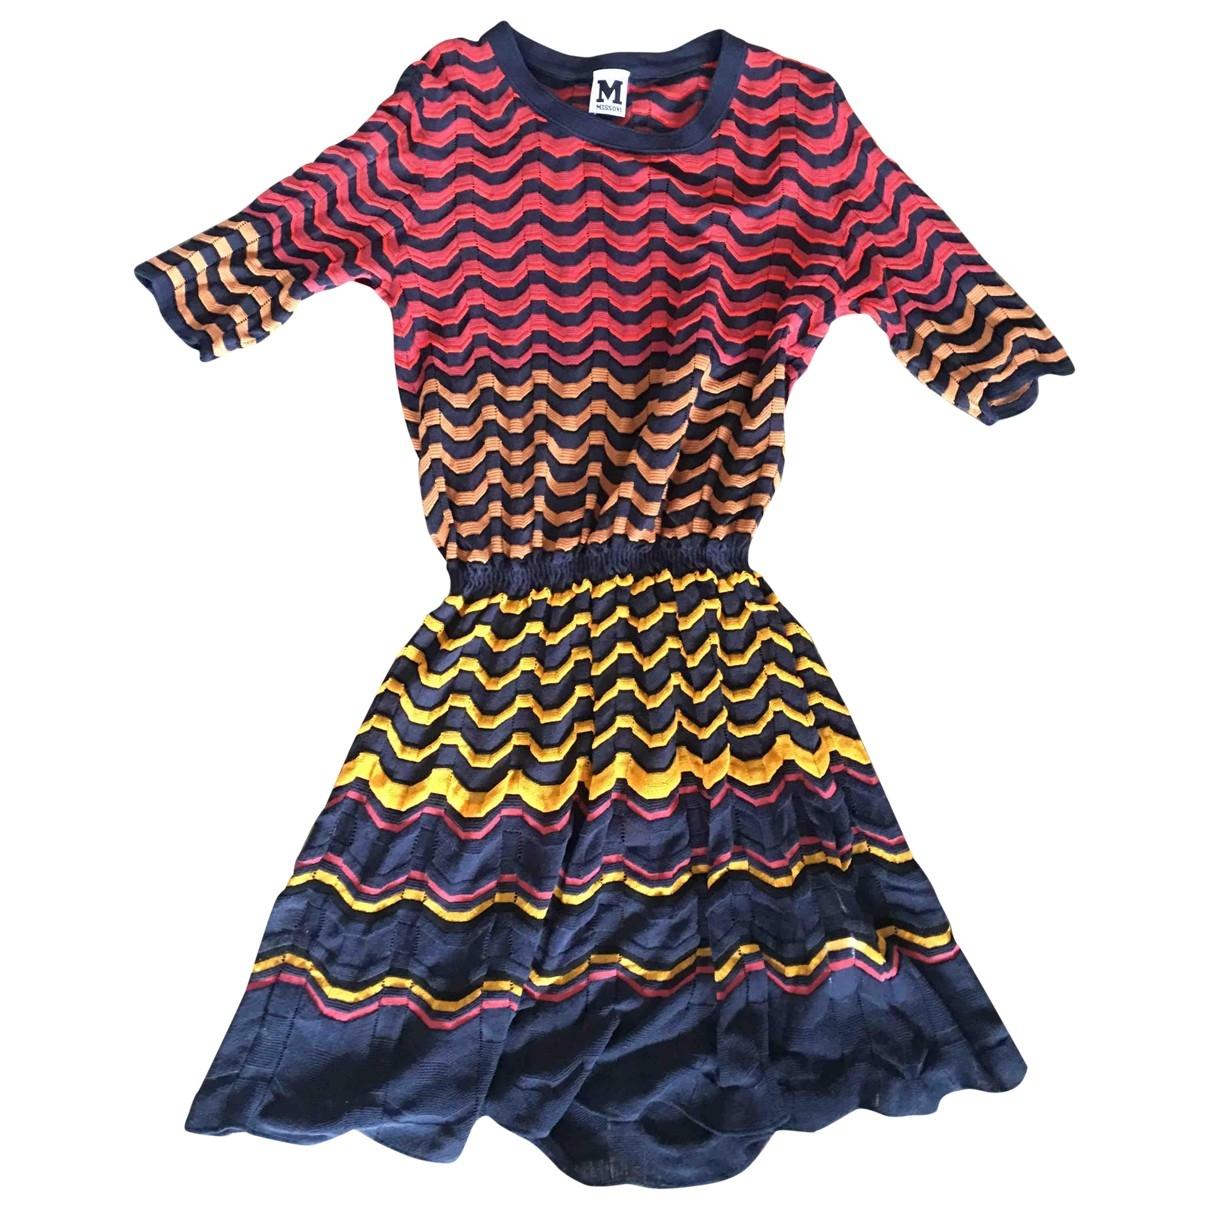 M Missoni \N Multicolour Cotton - elasthane dress for Women 38 FR